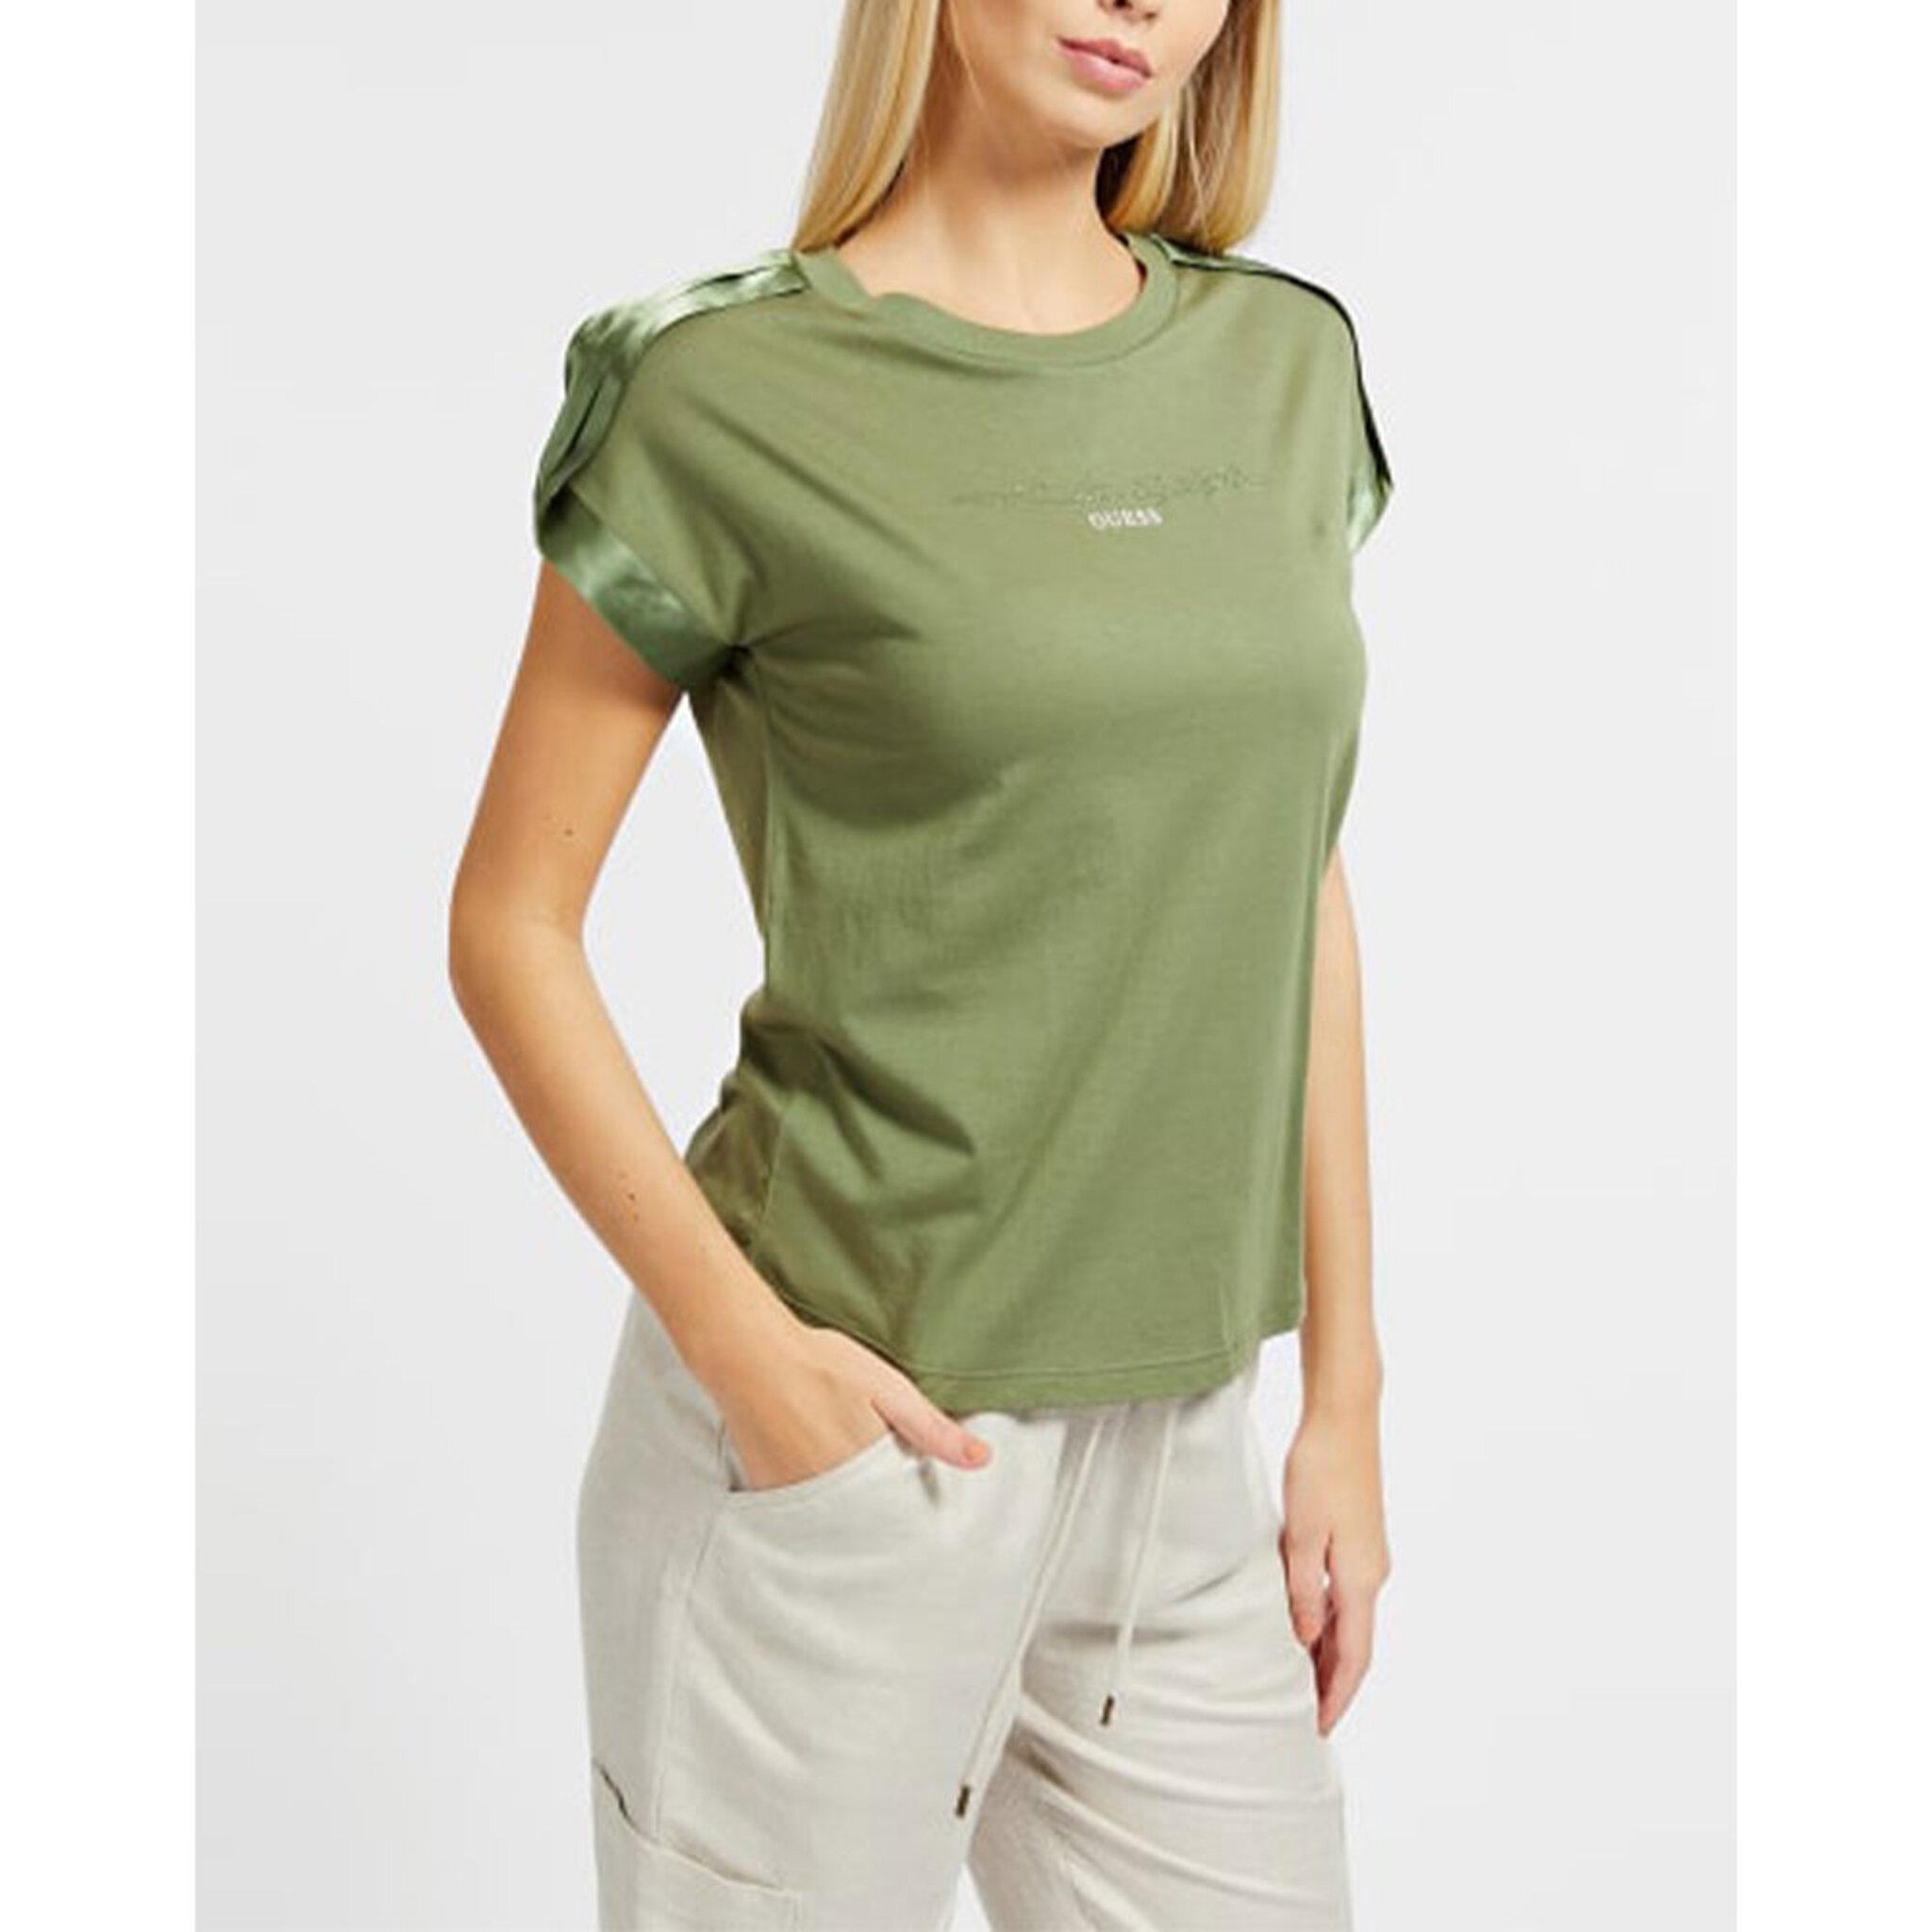 Ss Cn Marlena Tshirt Short Sleeves